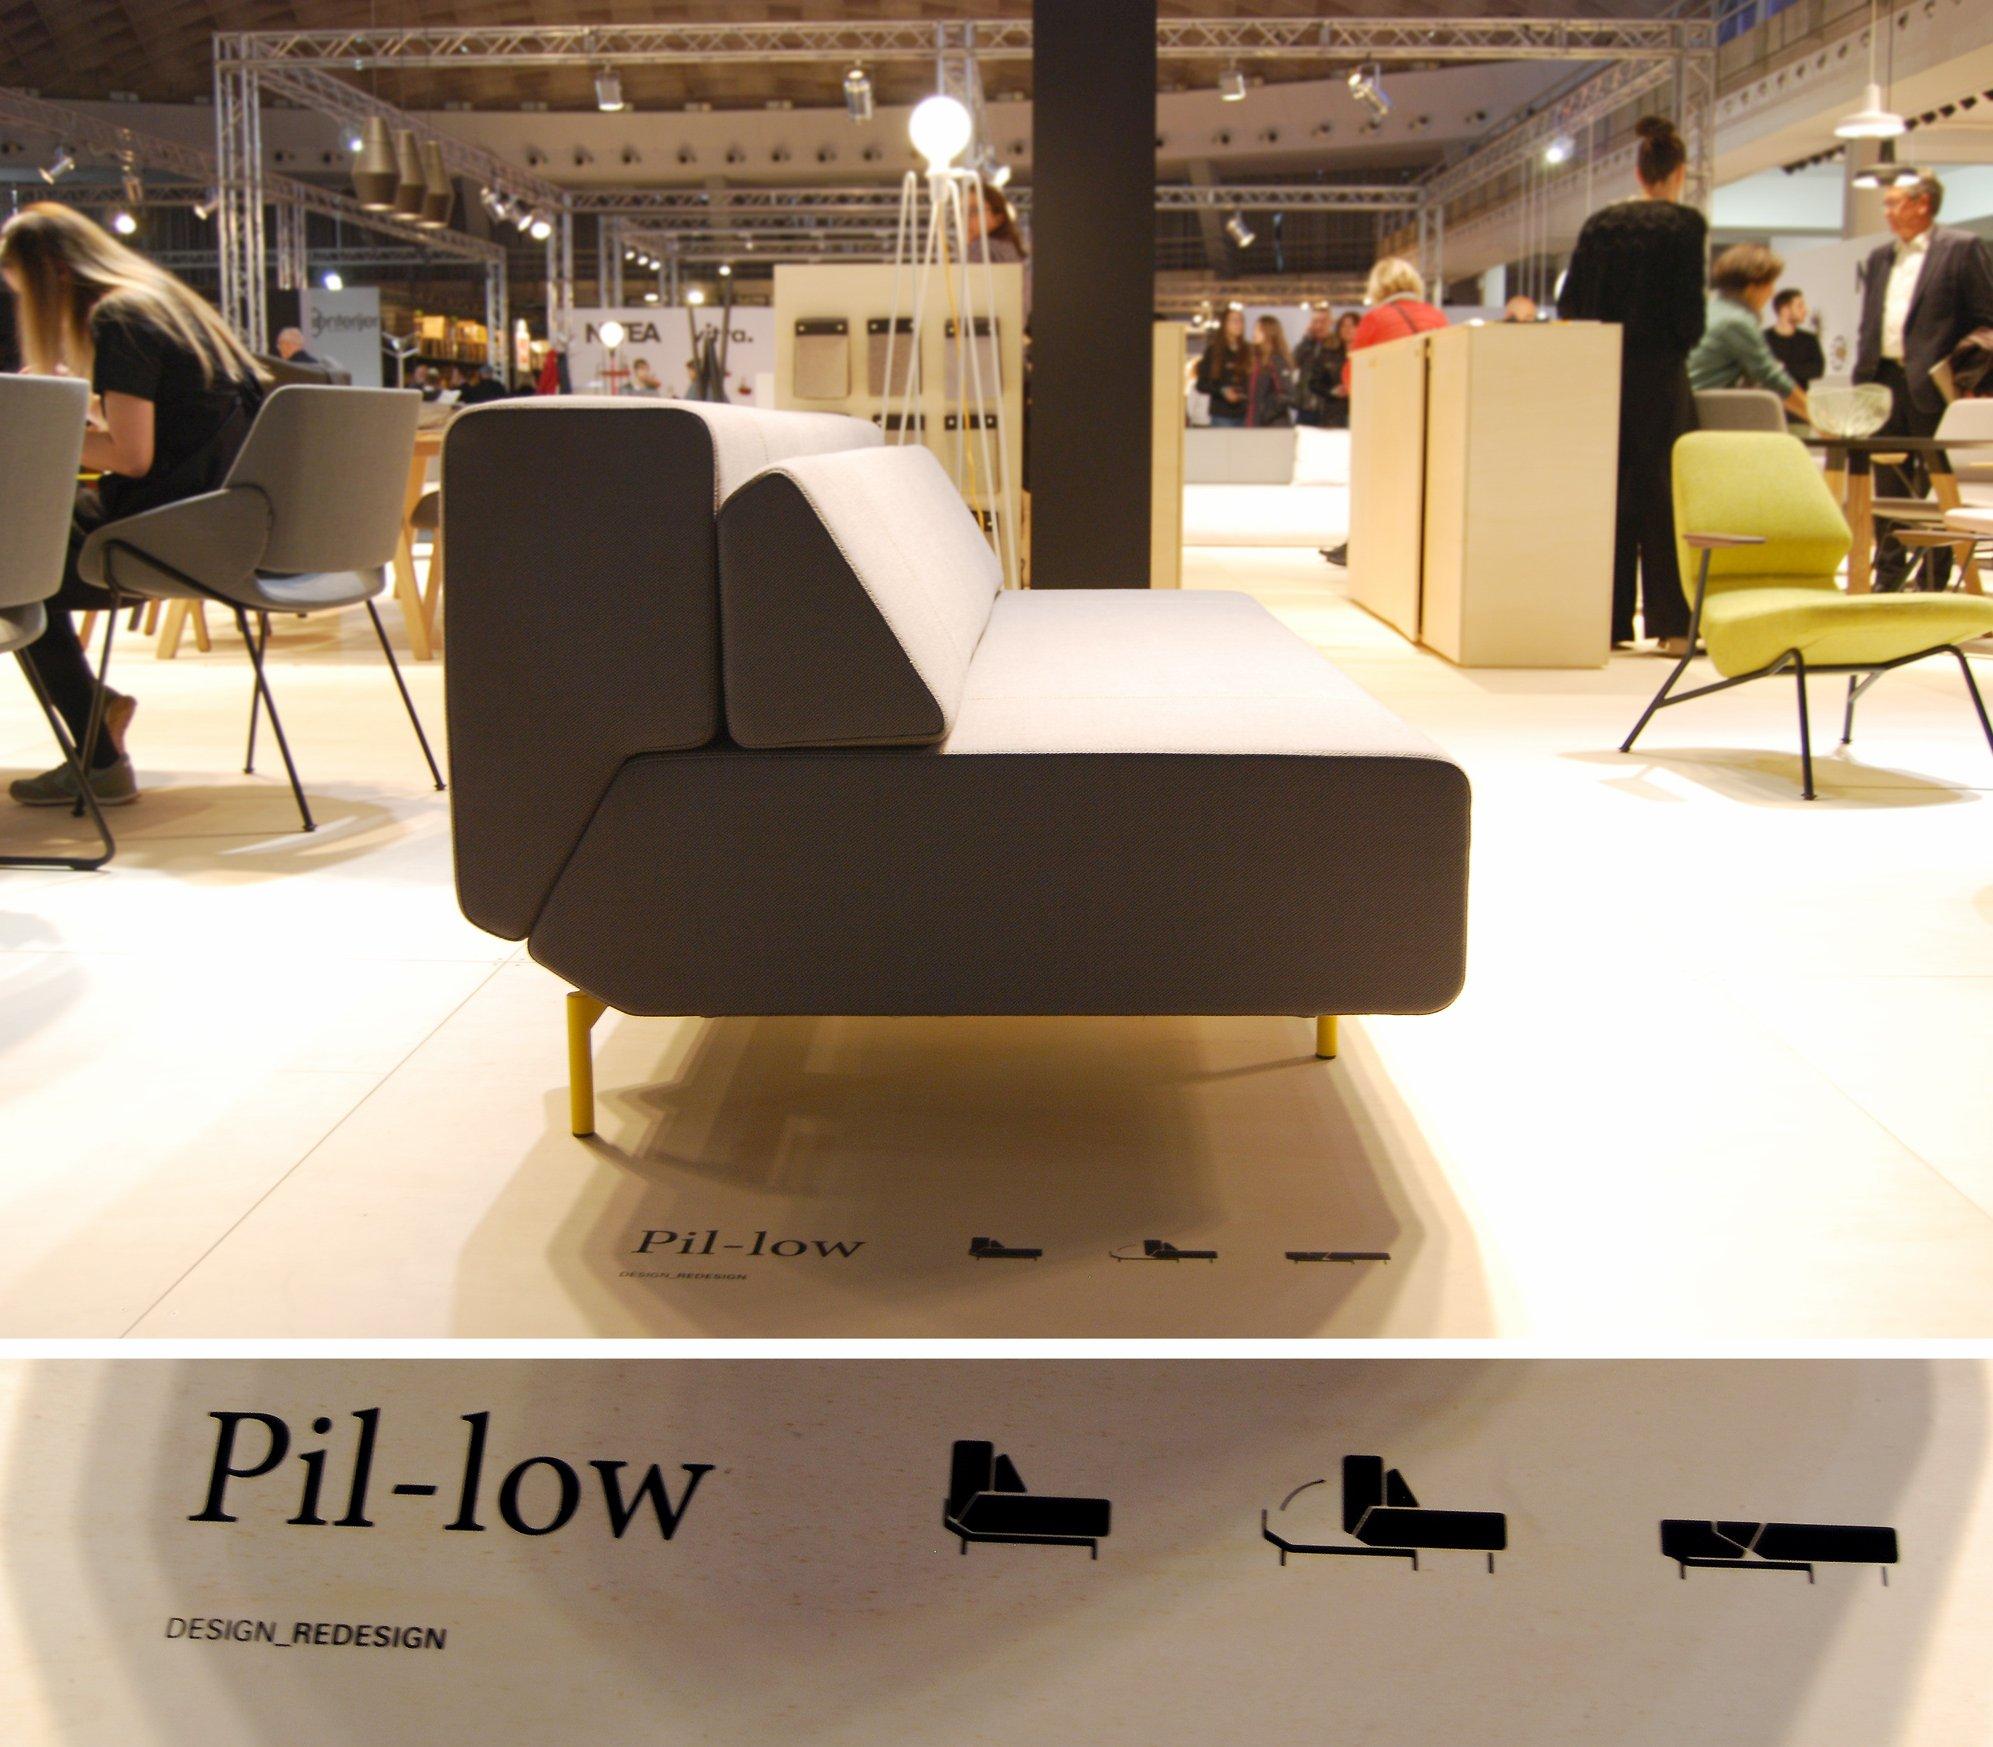 PIL-LOW_dizajn_sofa_salon namestaja